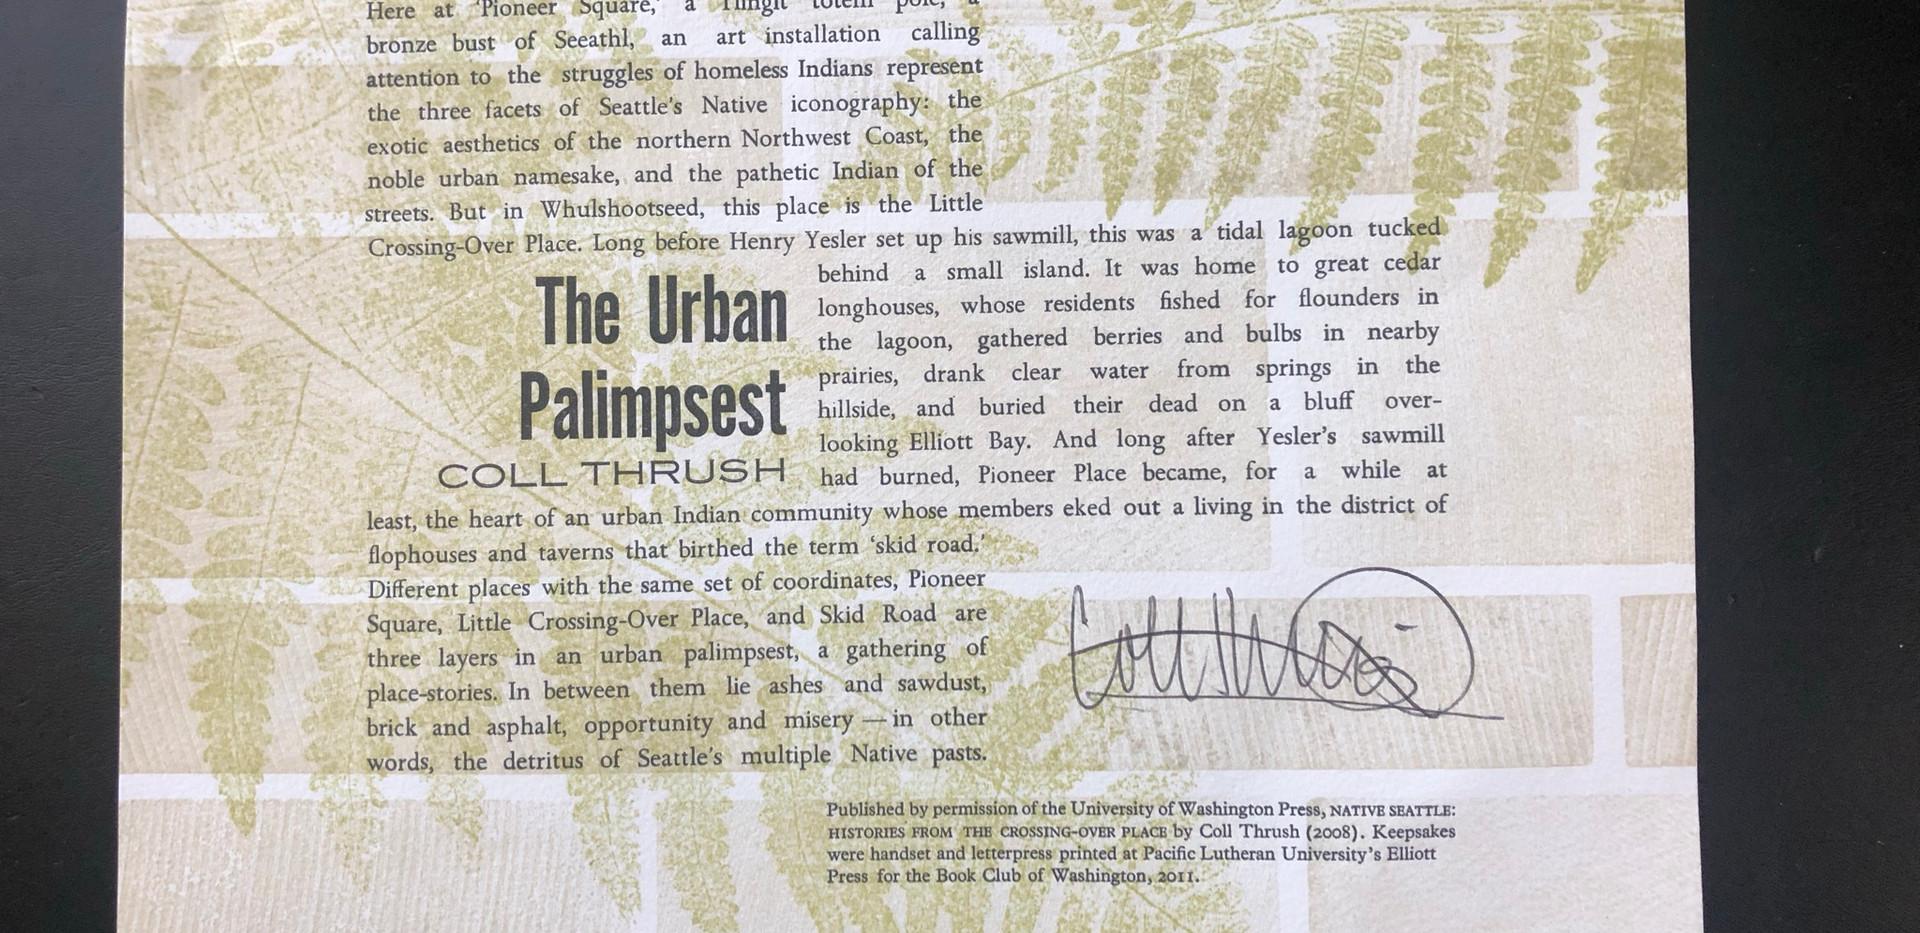 The Urban Palimpsest keepsake (2011)